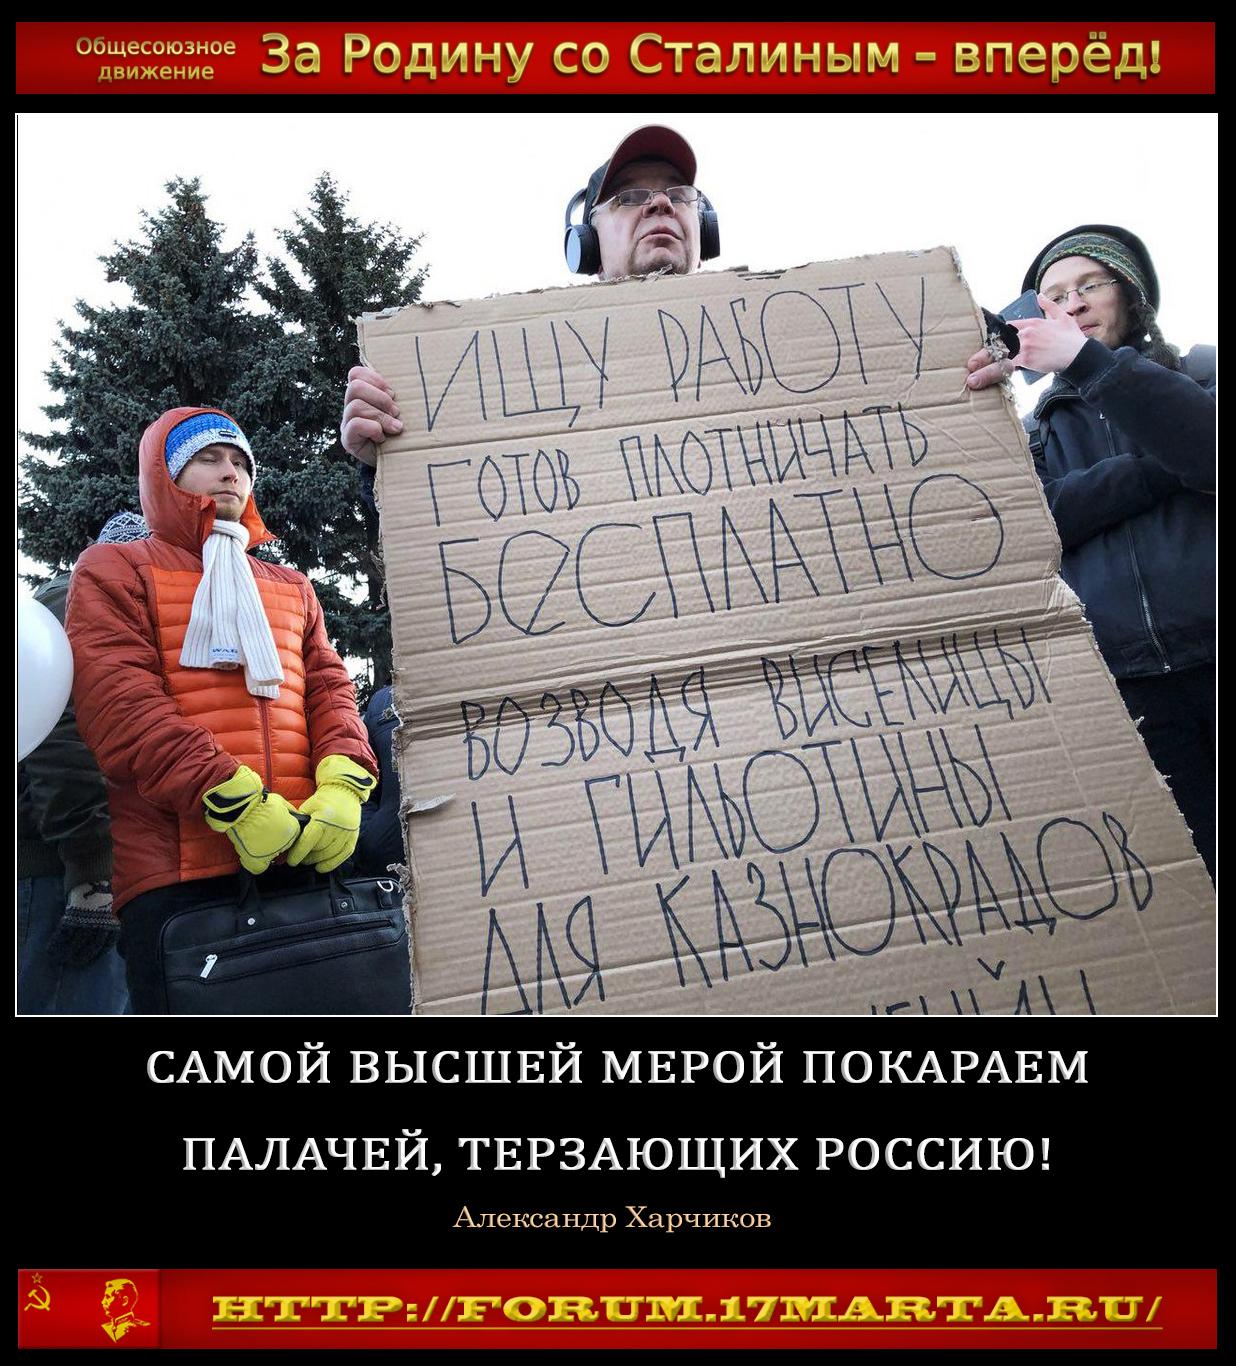 https://images.vfl.ru/ii/1531631828/352f2696/22488245.jpg